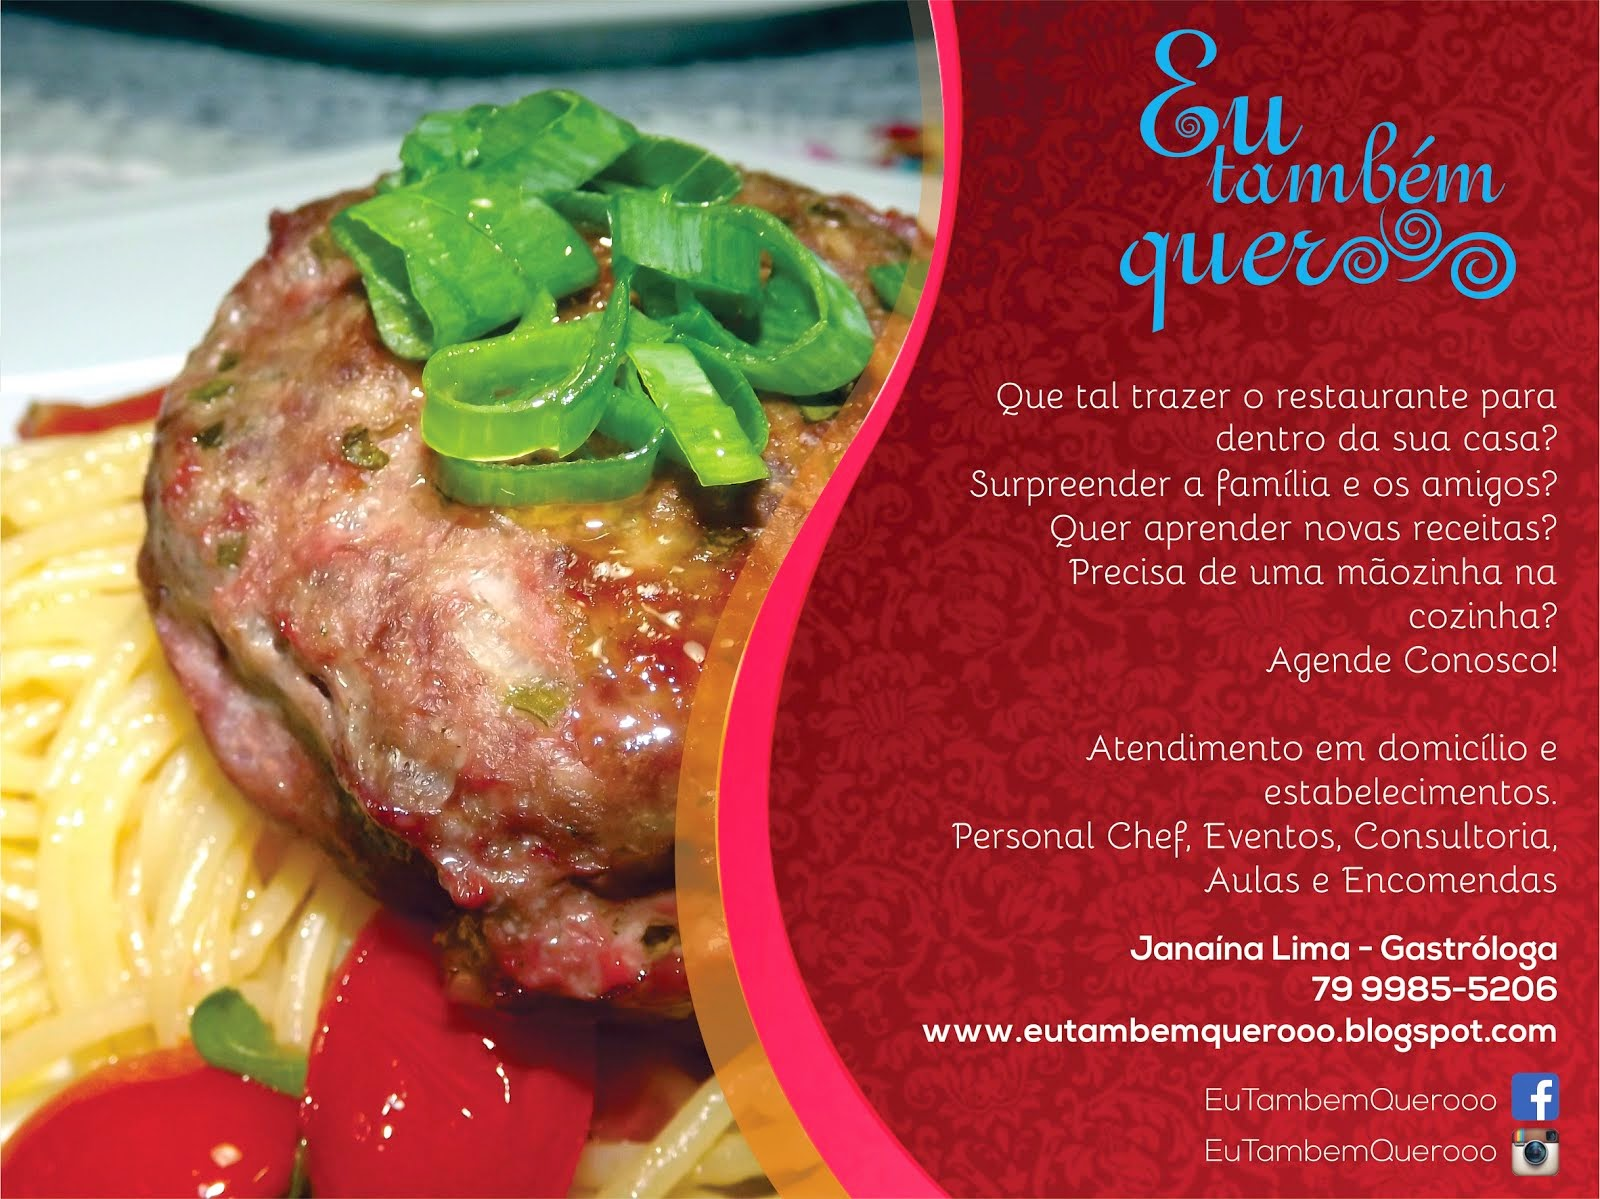 Conheça também: www.eutambemquerooo.blogspot.com